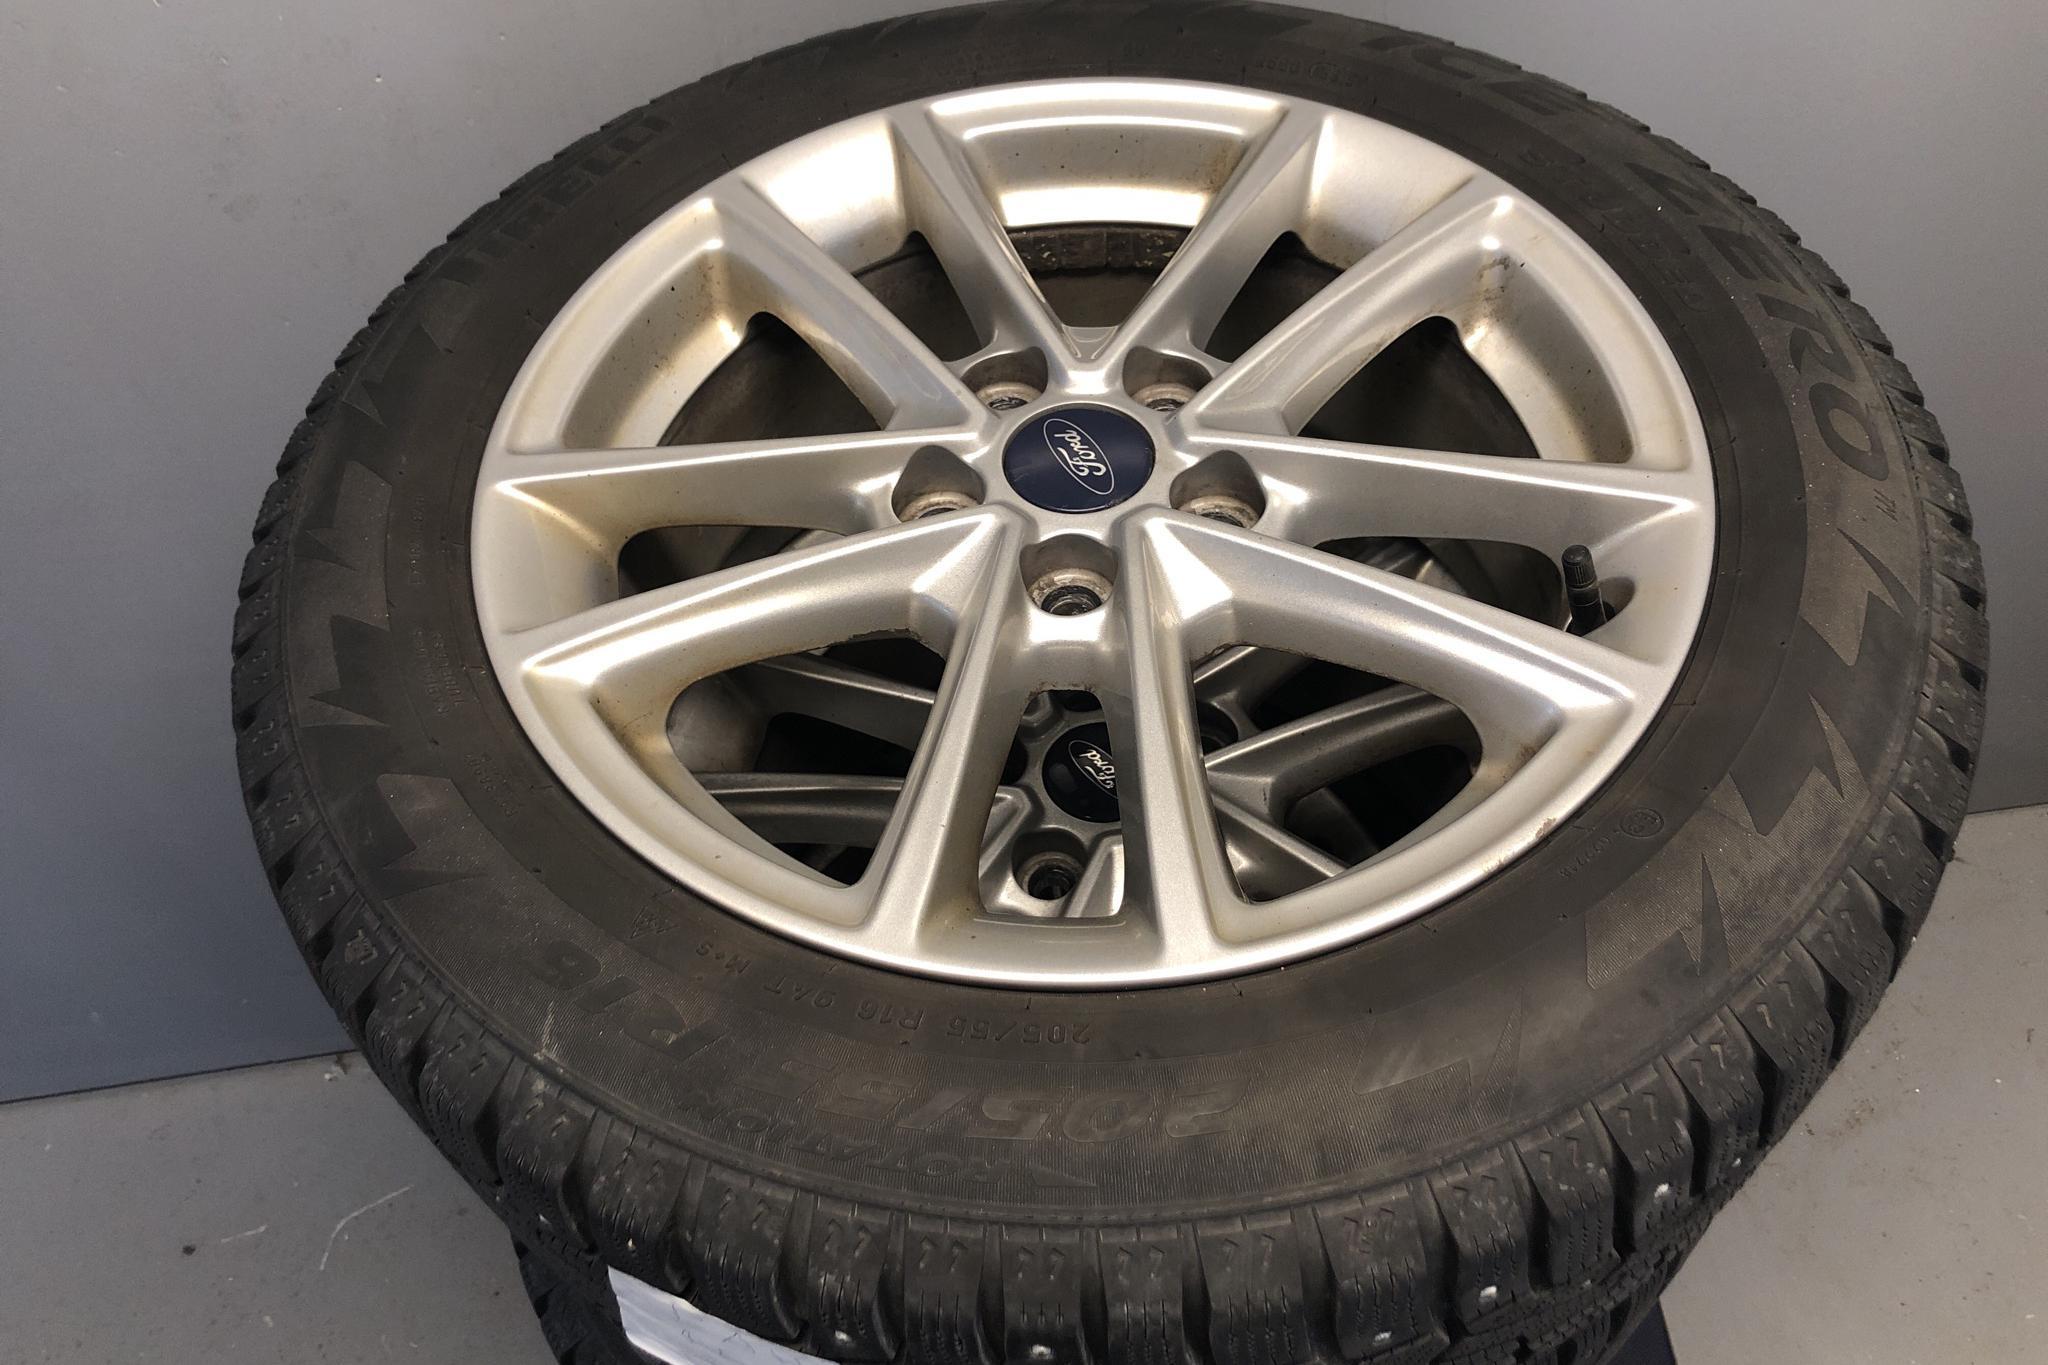 Ford Focus 1.0 EcoBoost Kombi (100hk) - 9 582 mil - Manuell - svart - 2016